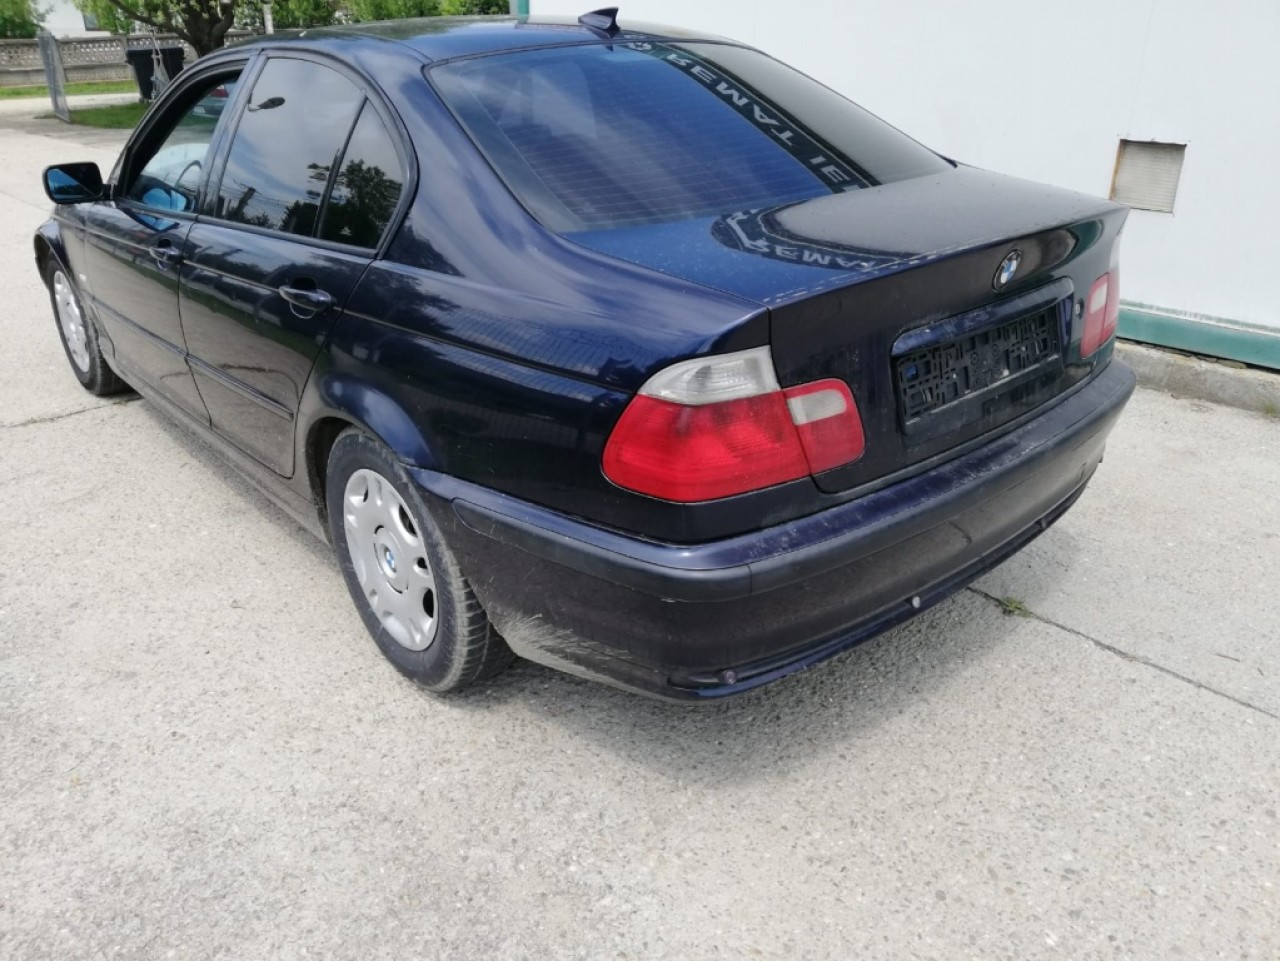 FAR STANGA COMPLET CU SEMNALIZARE BMW SERIA 3 E46 FAB. 1998 – 2005 ⭐⭐⭐⭐⭐